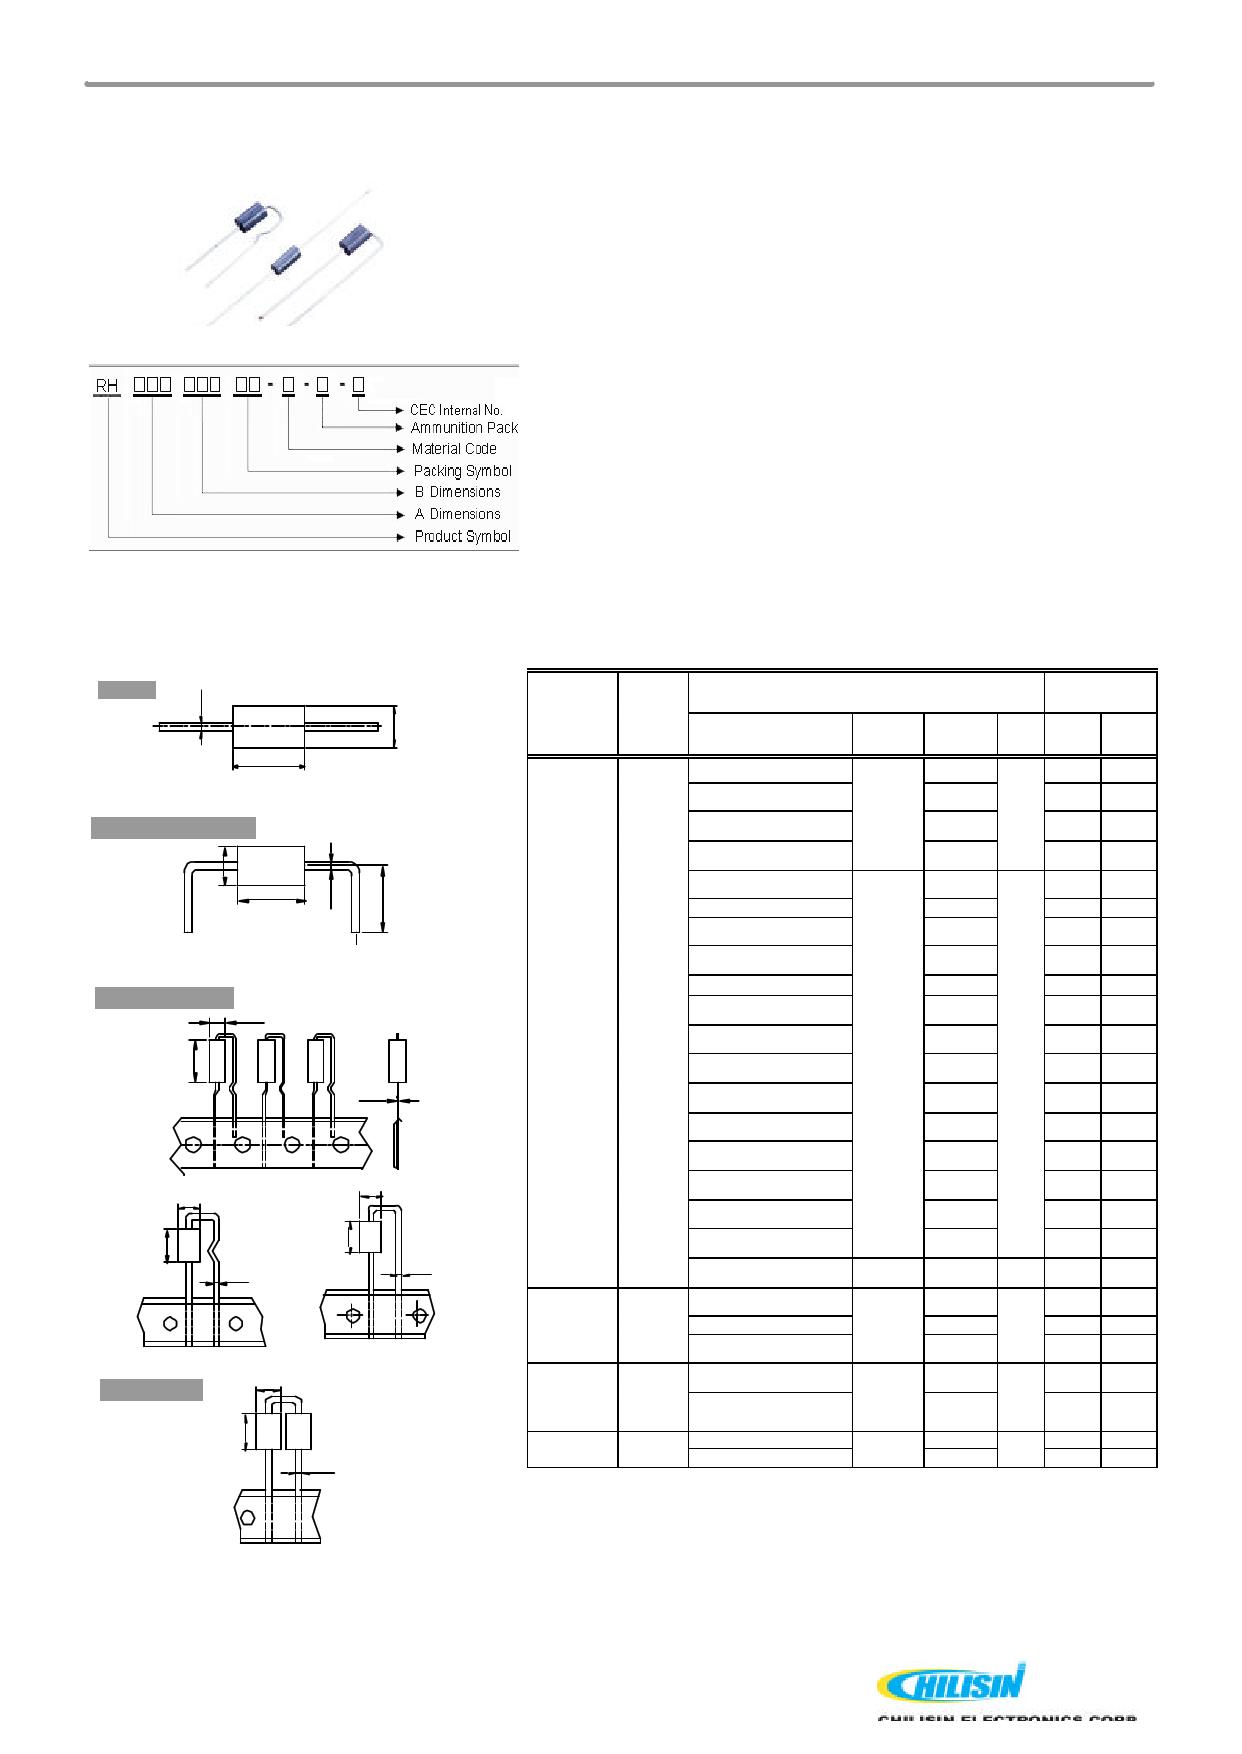 RH03503 데이터시트 및 RH03503 PDF